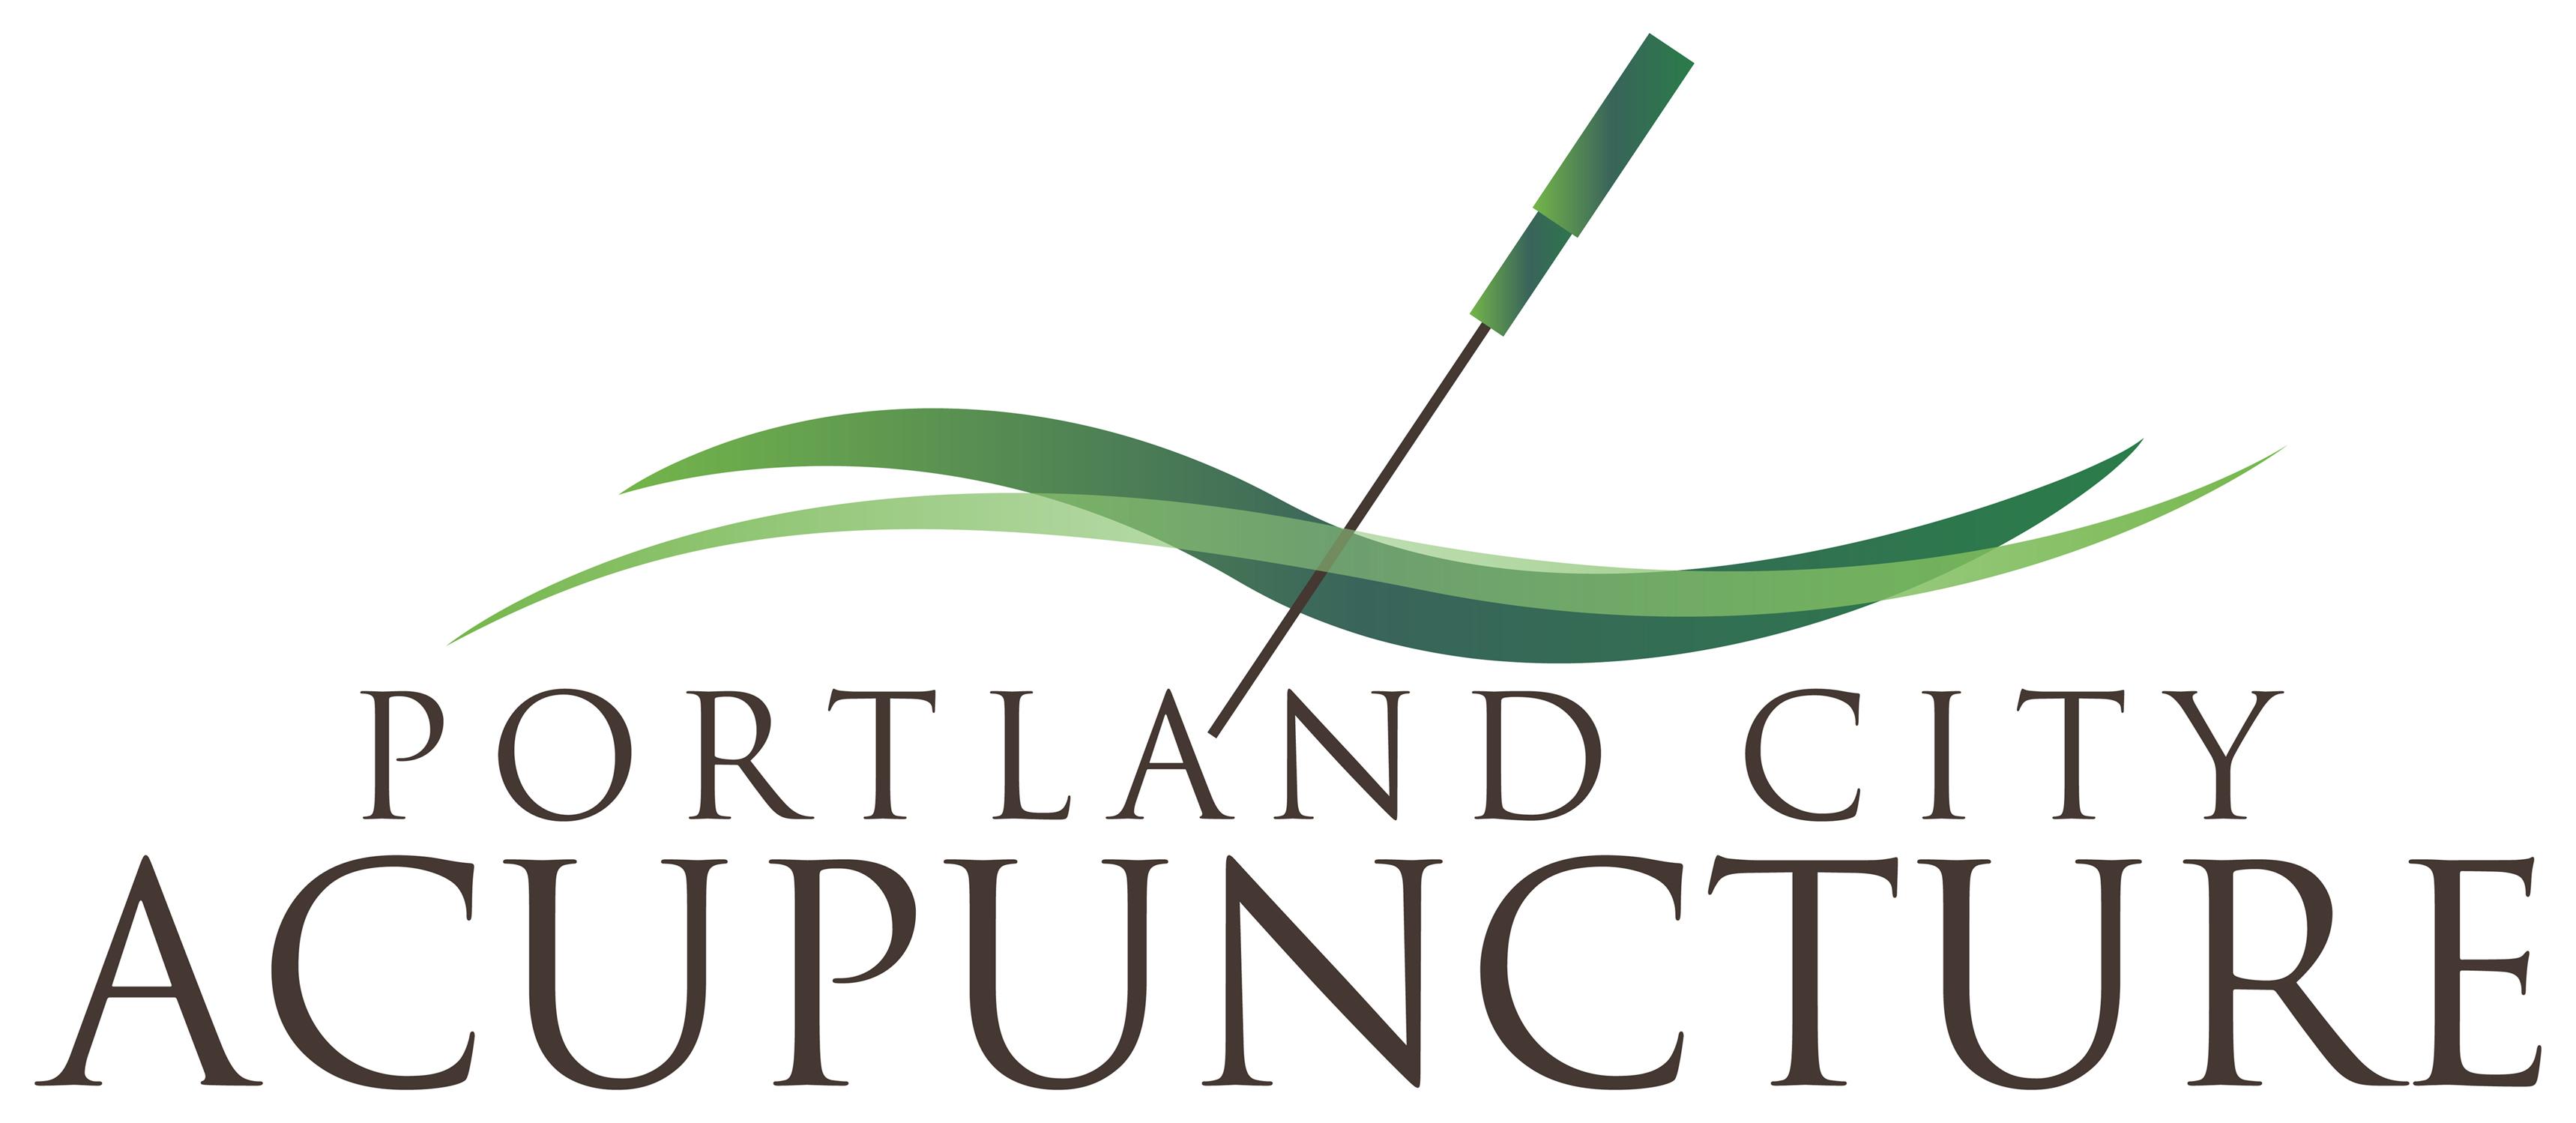 Portland City Acupuncture